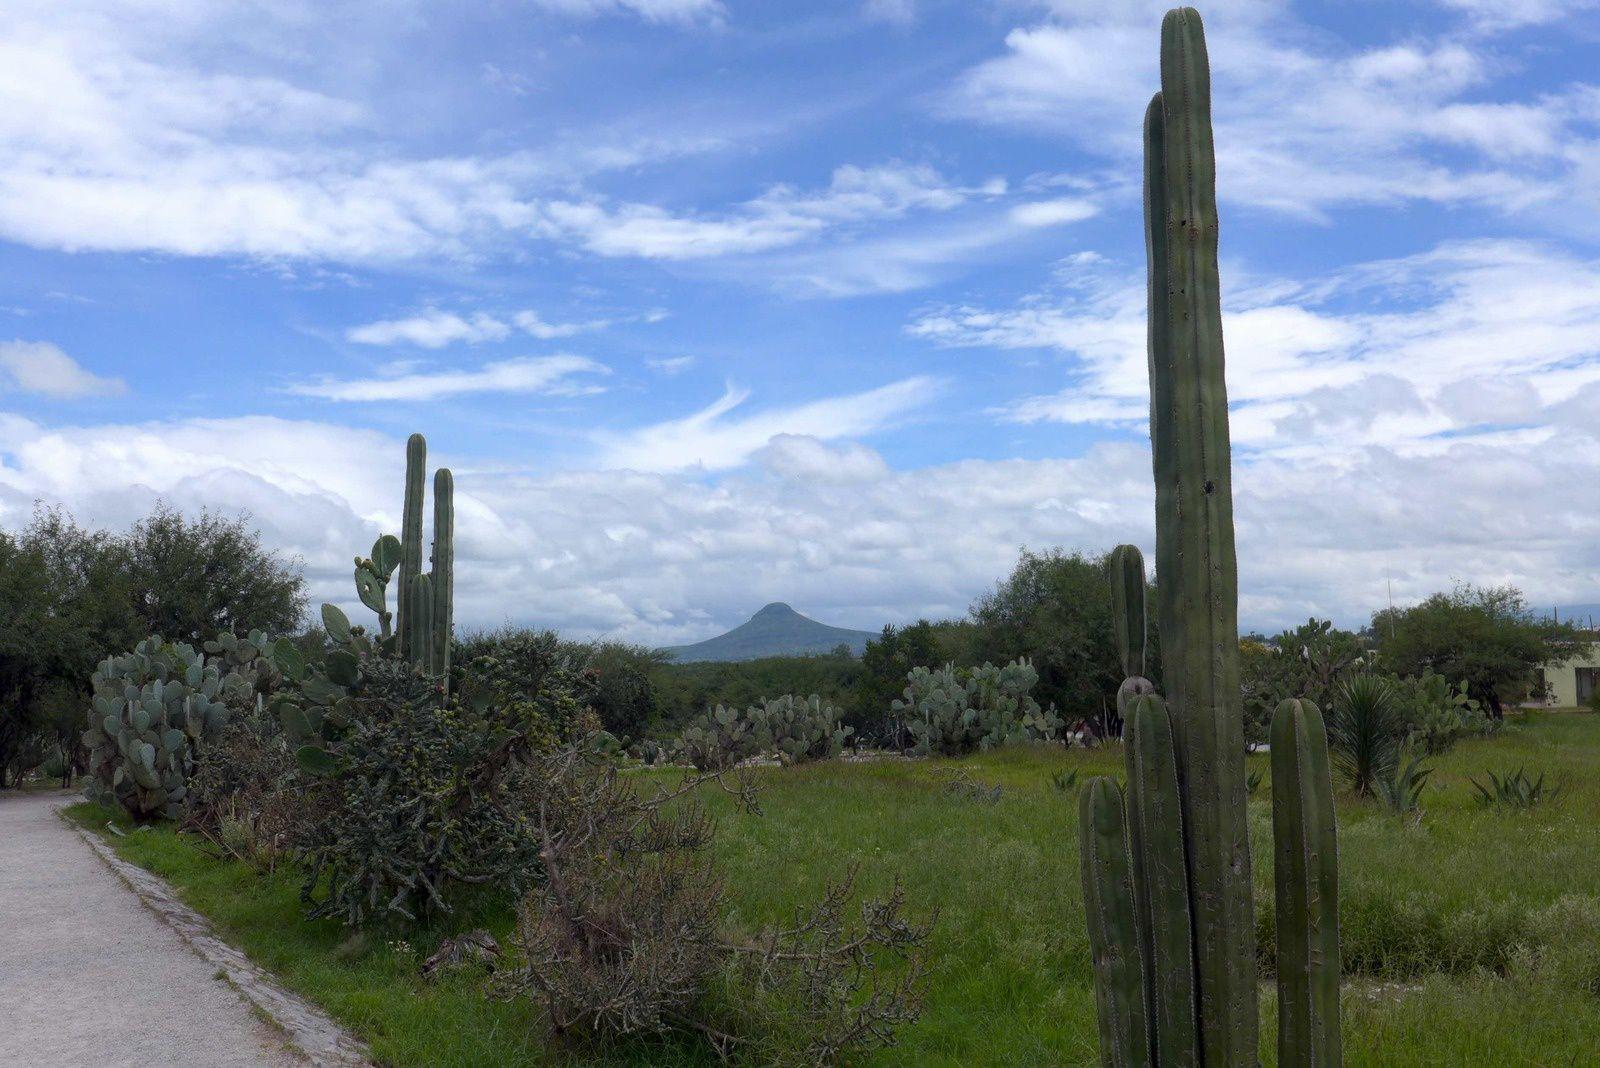 Tula petite balade dans les cactus